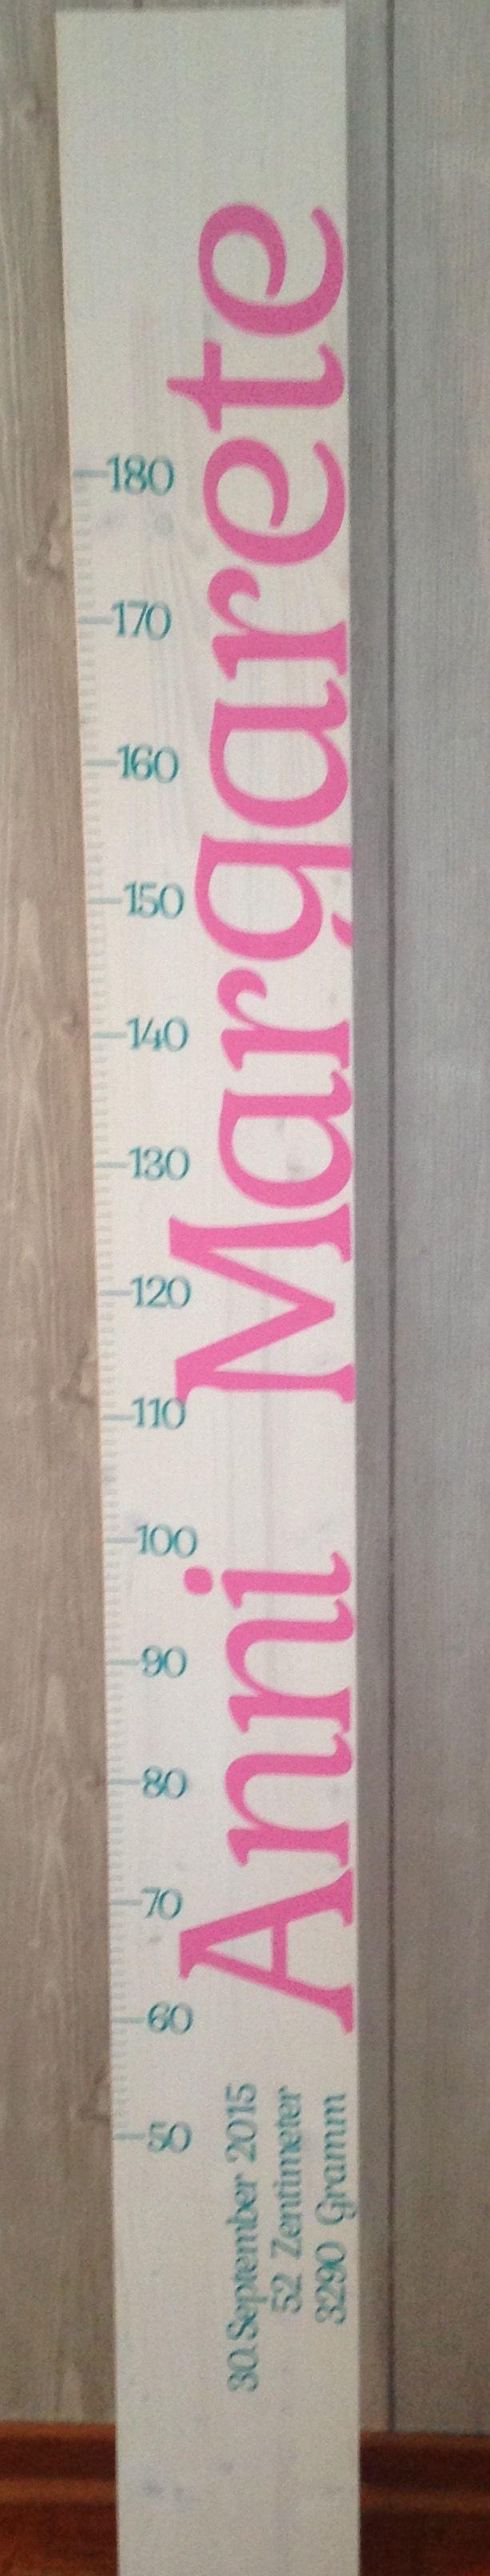 larissaswelt Kindermesslatte Oktober 2015  ANNI MARGARETE 200cm Design 4 ( mit Großbuchstaben am Anfang)  Farbe: türkis + rosa